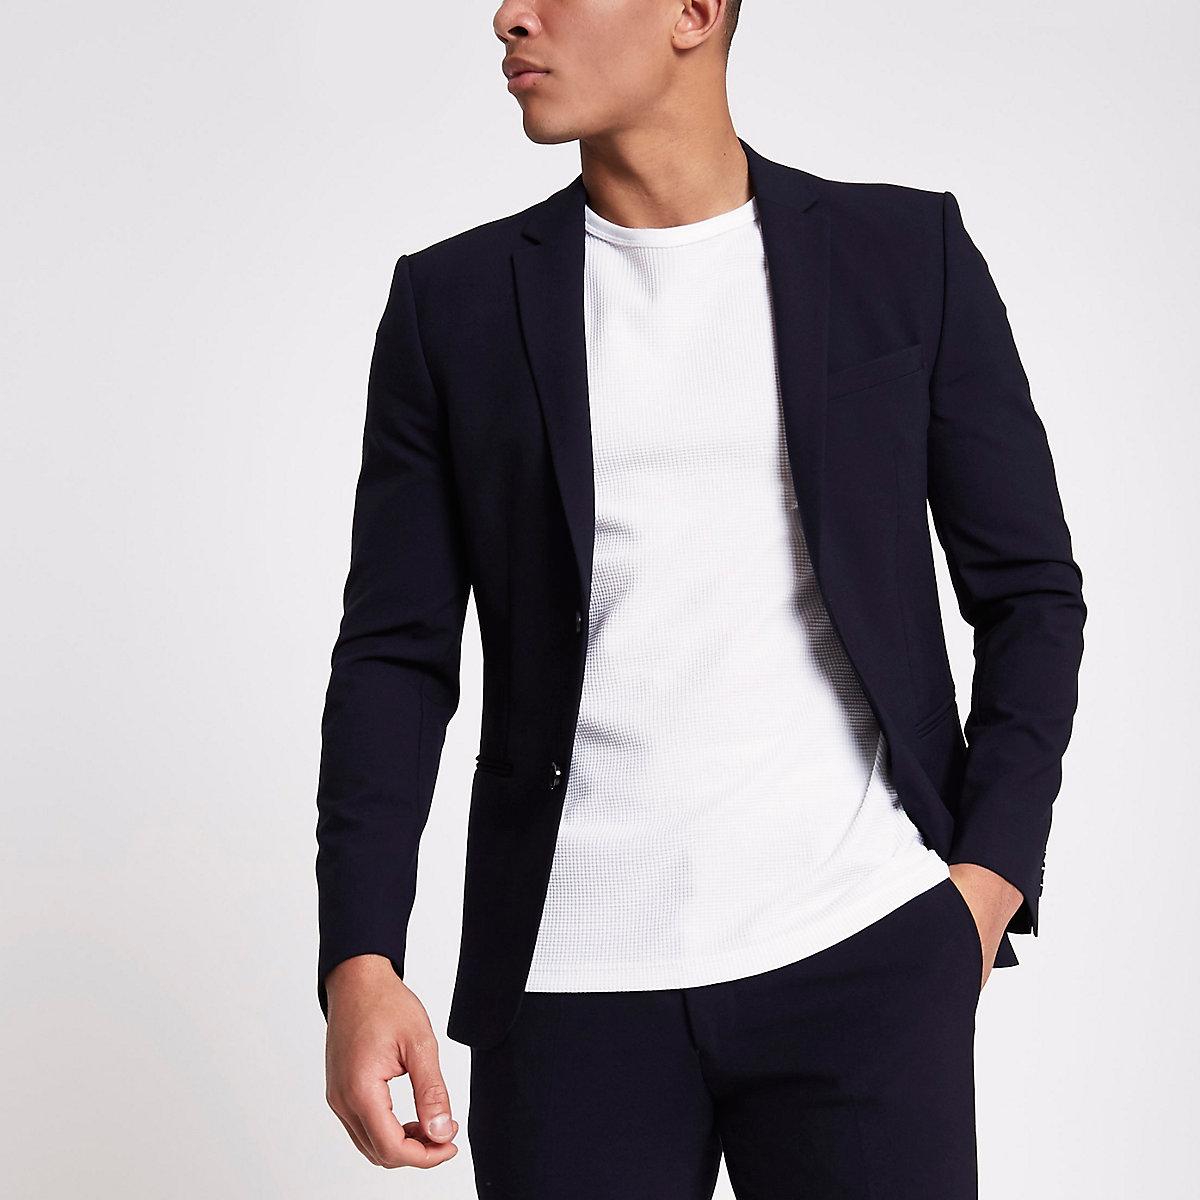 Navy super skinny fit suit jacket